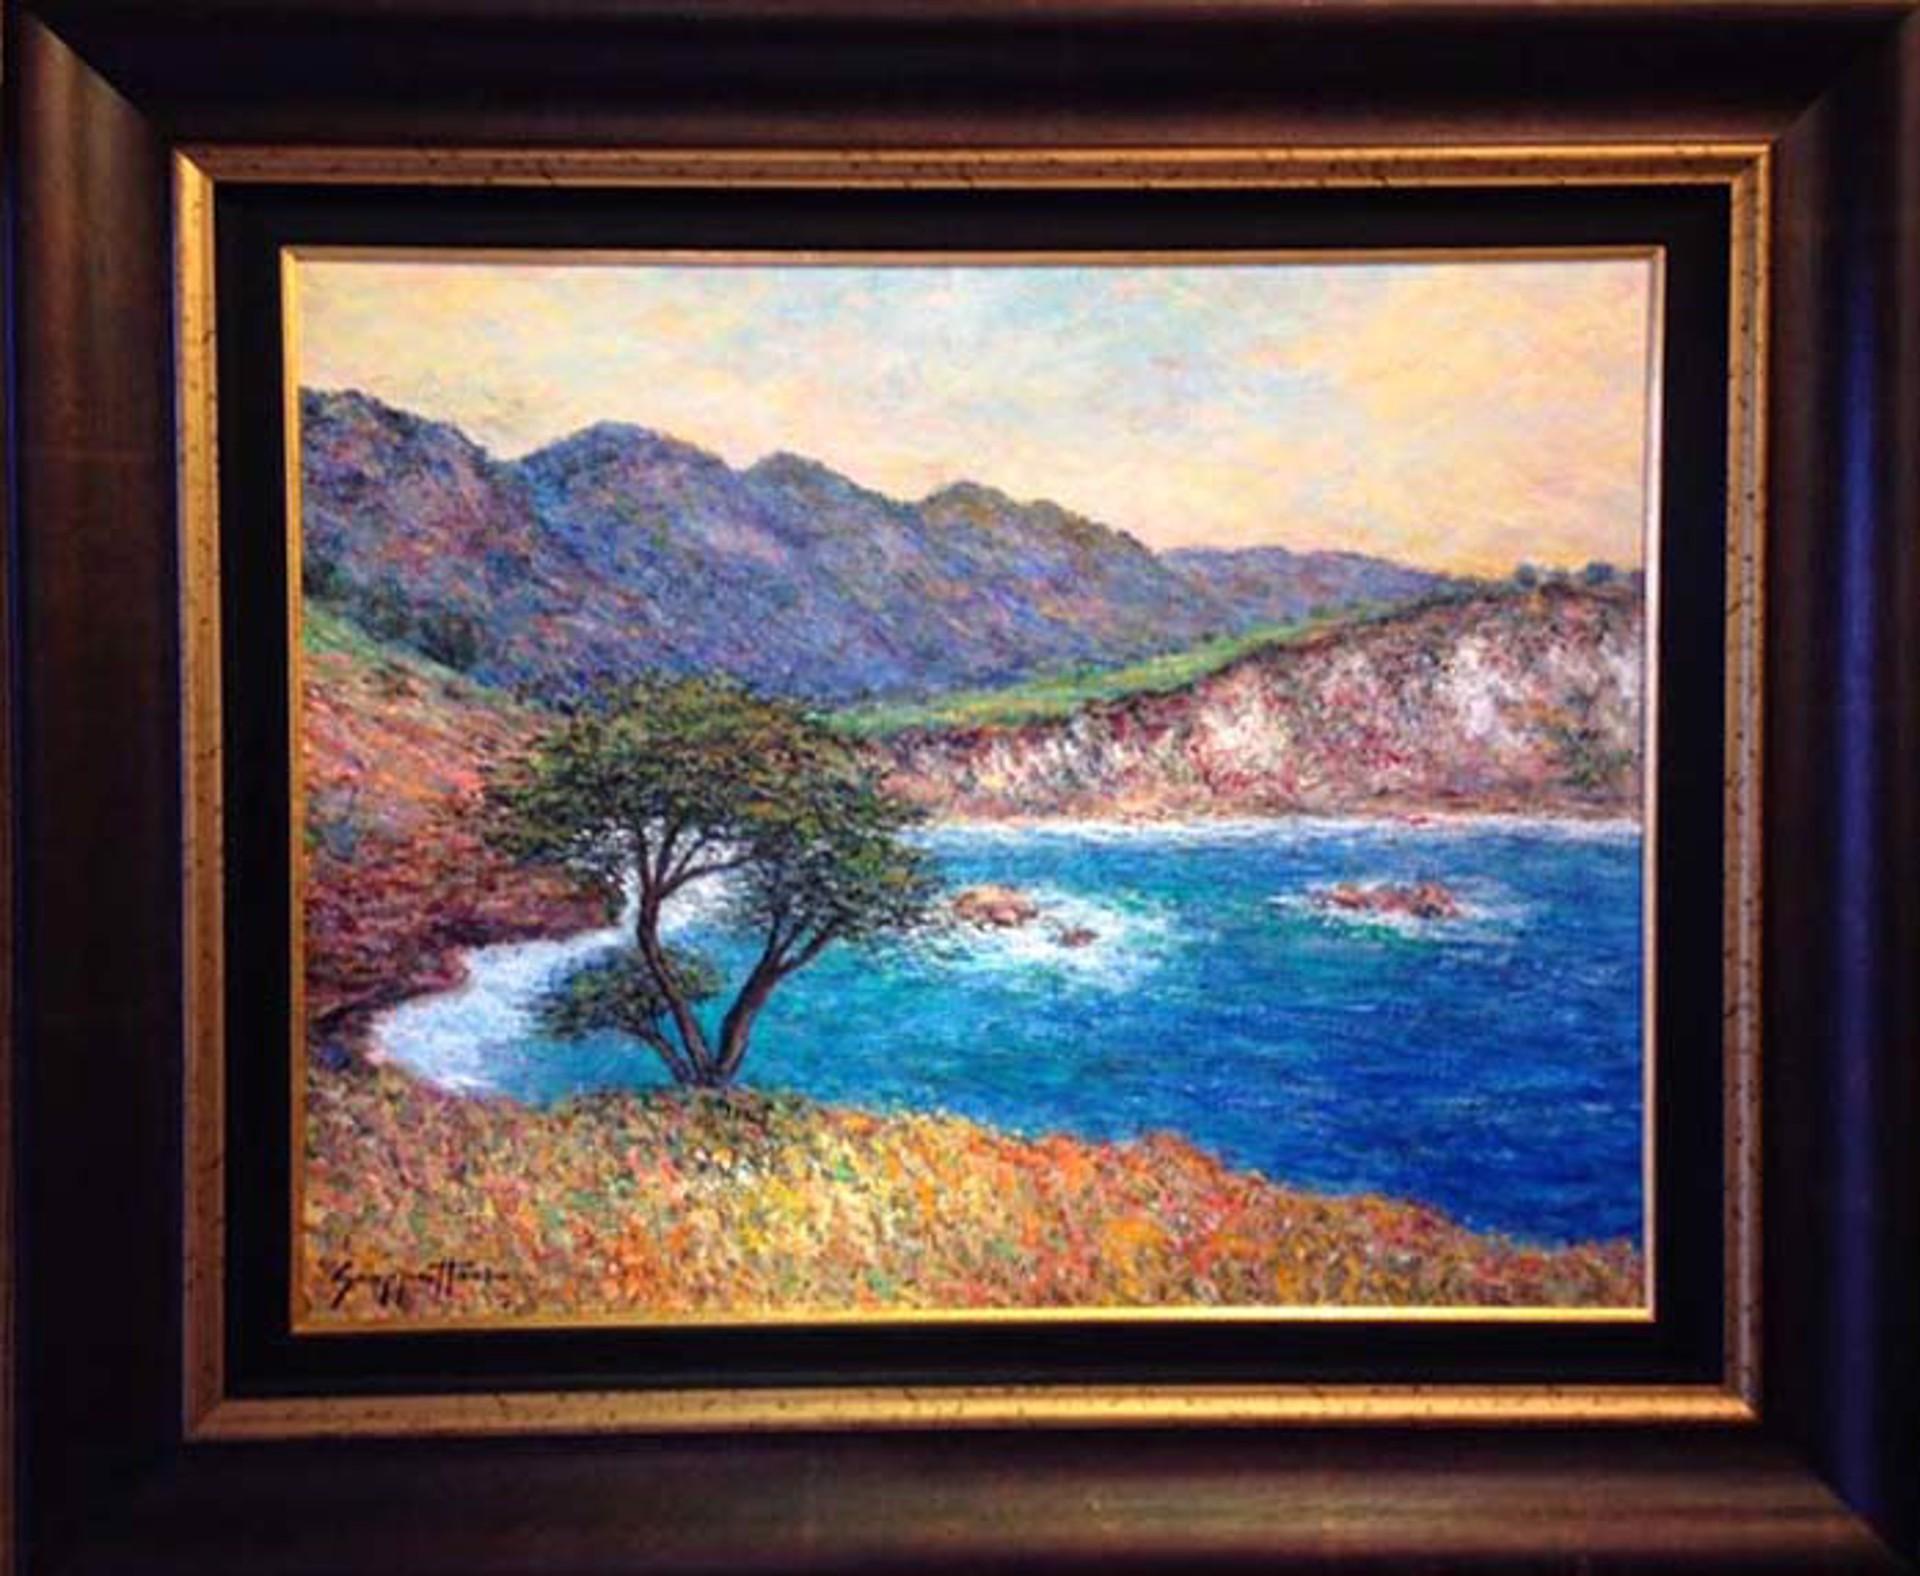 Carmel Vista by James Scoppettone